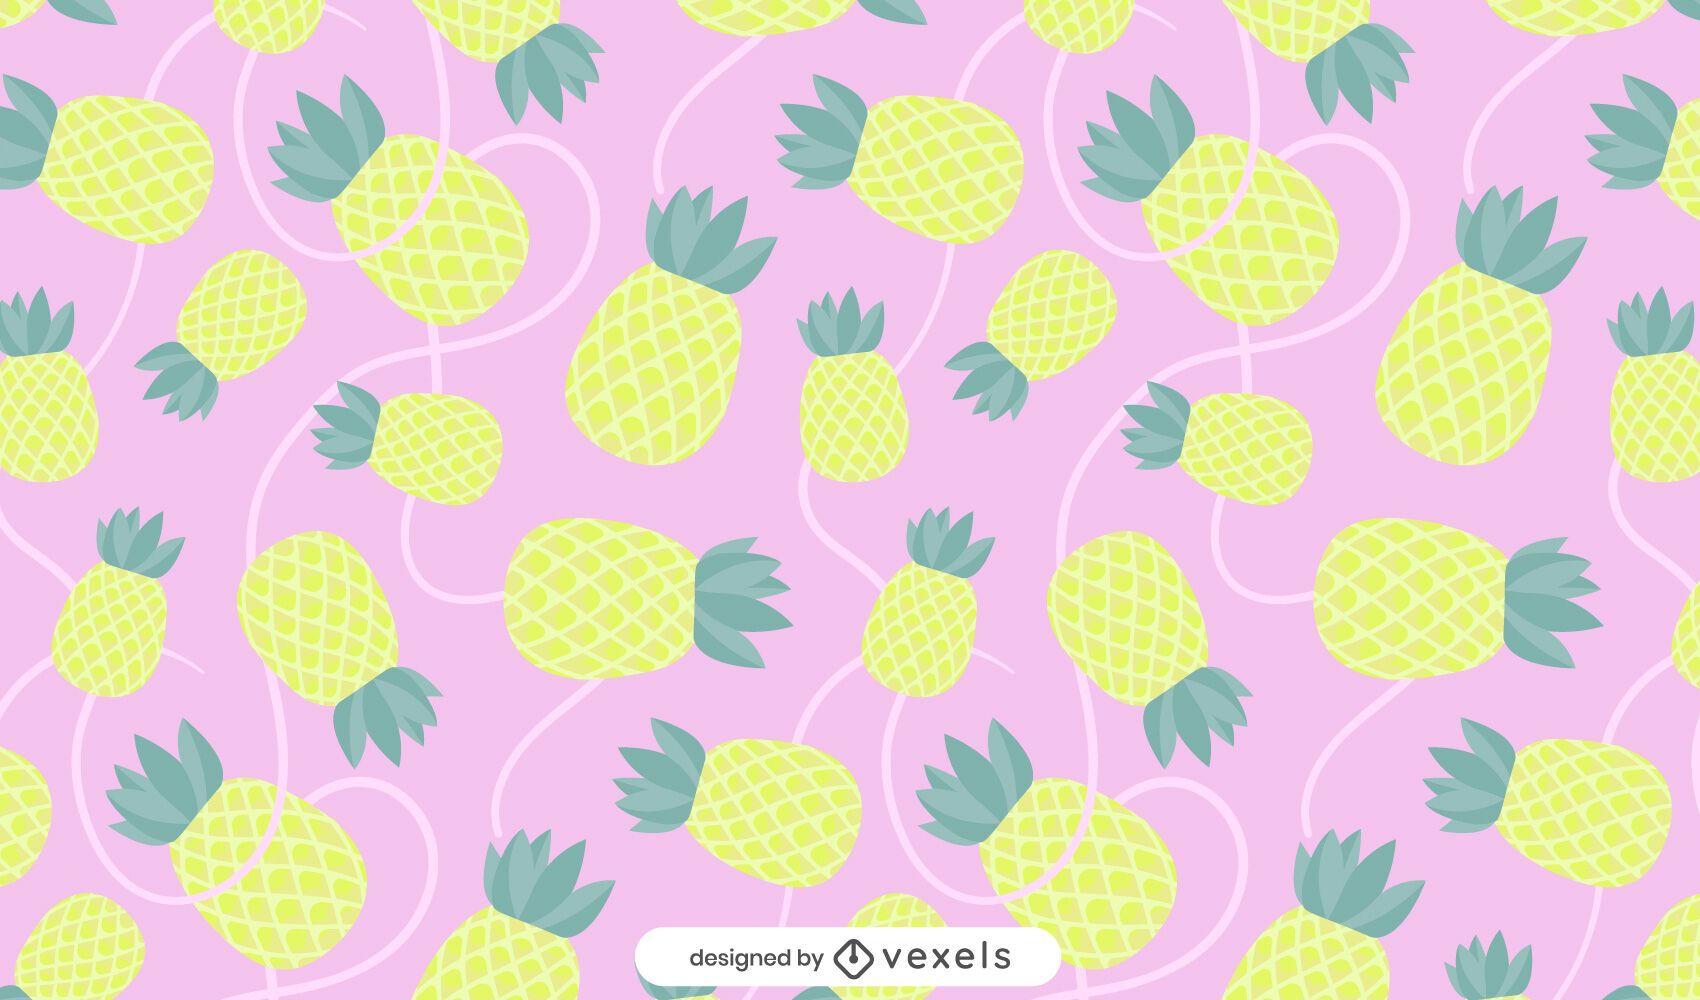 Flaches Ananasmusterdesign